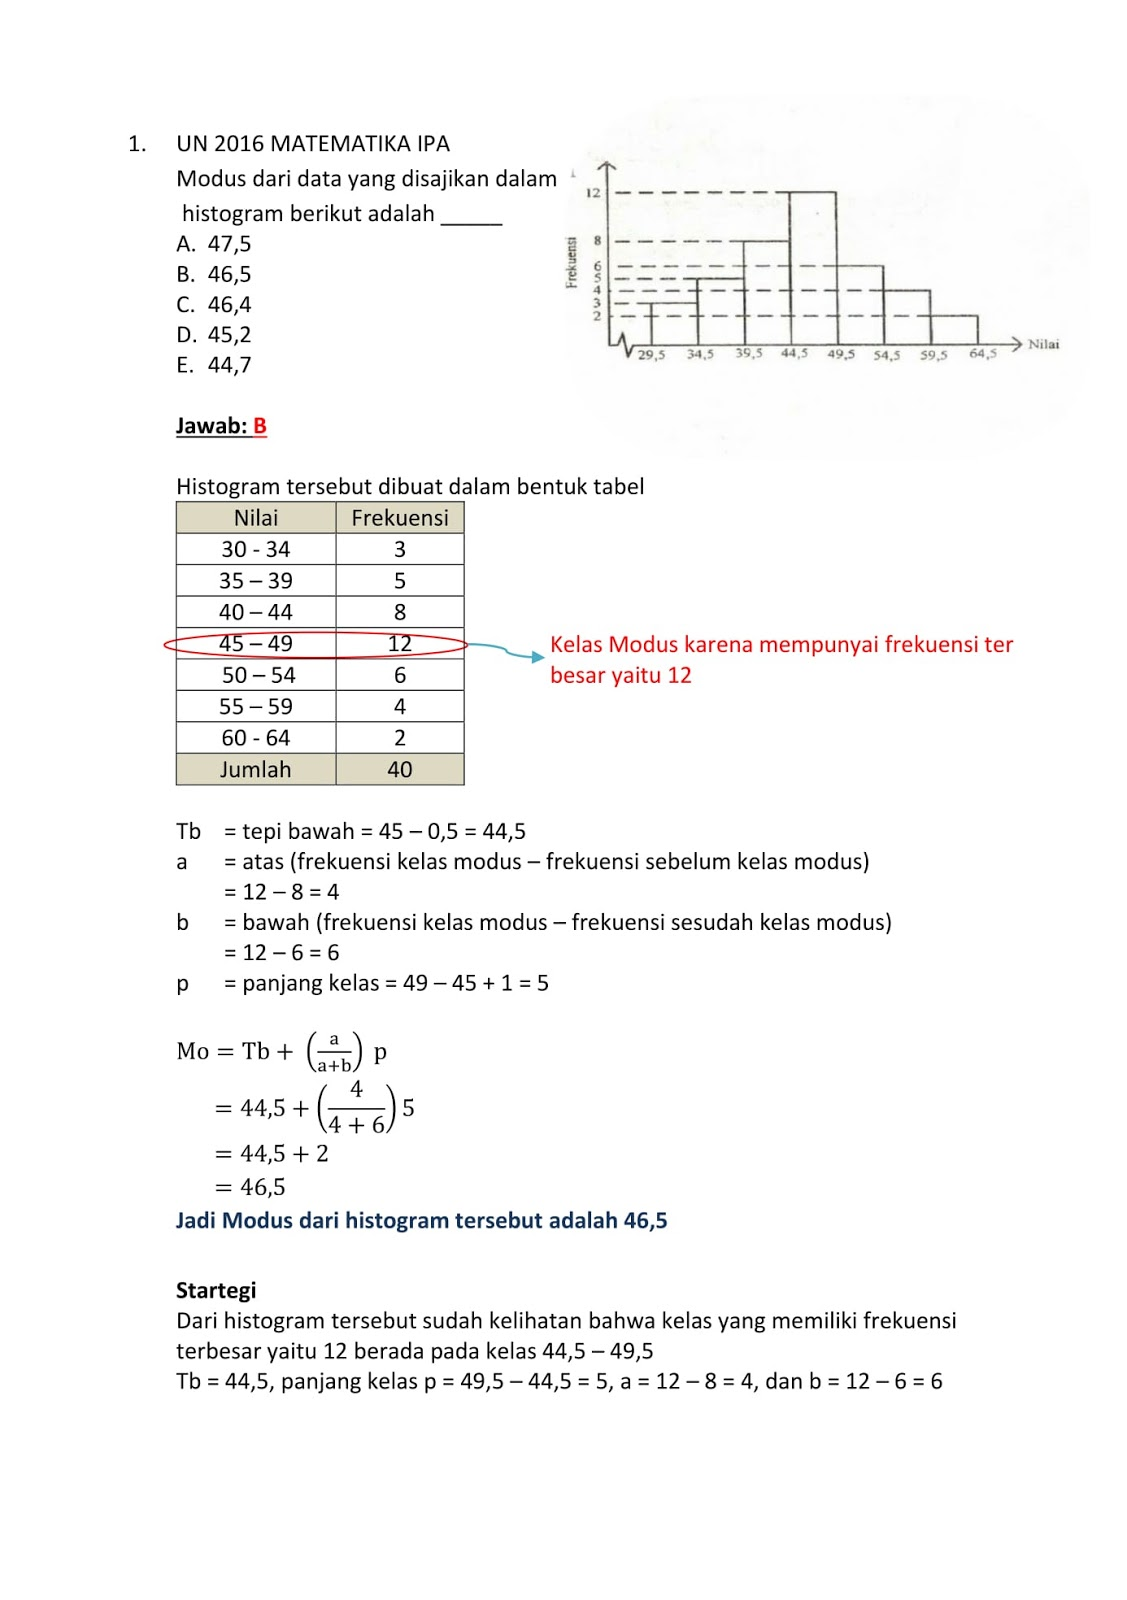 Contoh Soal Statistika Dan Pembahasannya : contoh, statistika, pembahasannya, Contoh, Sbmptn, Matematika, Statistika, Kumpulan, Pelajaran